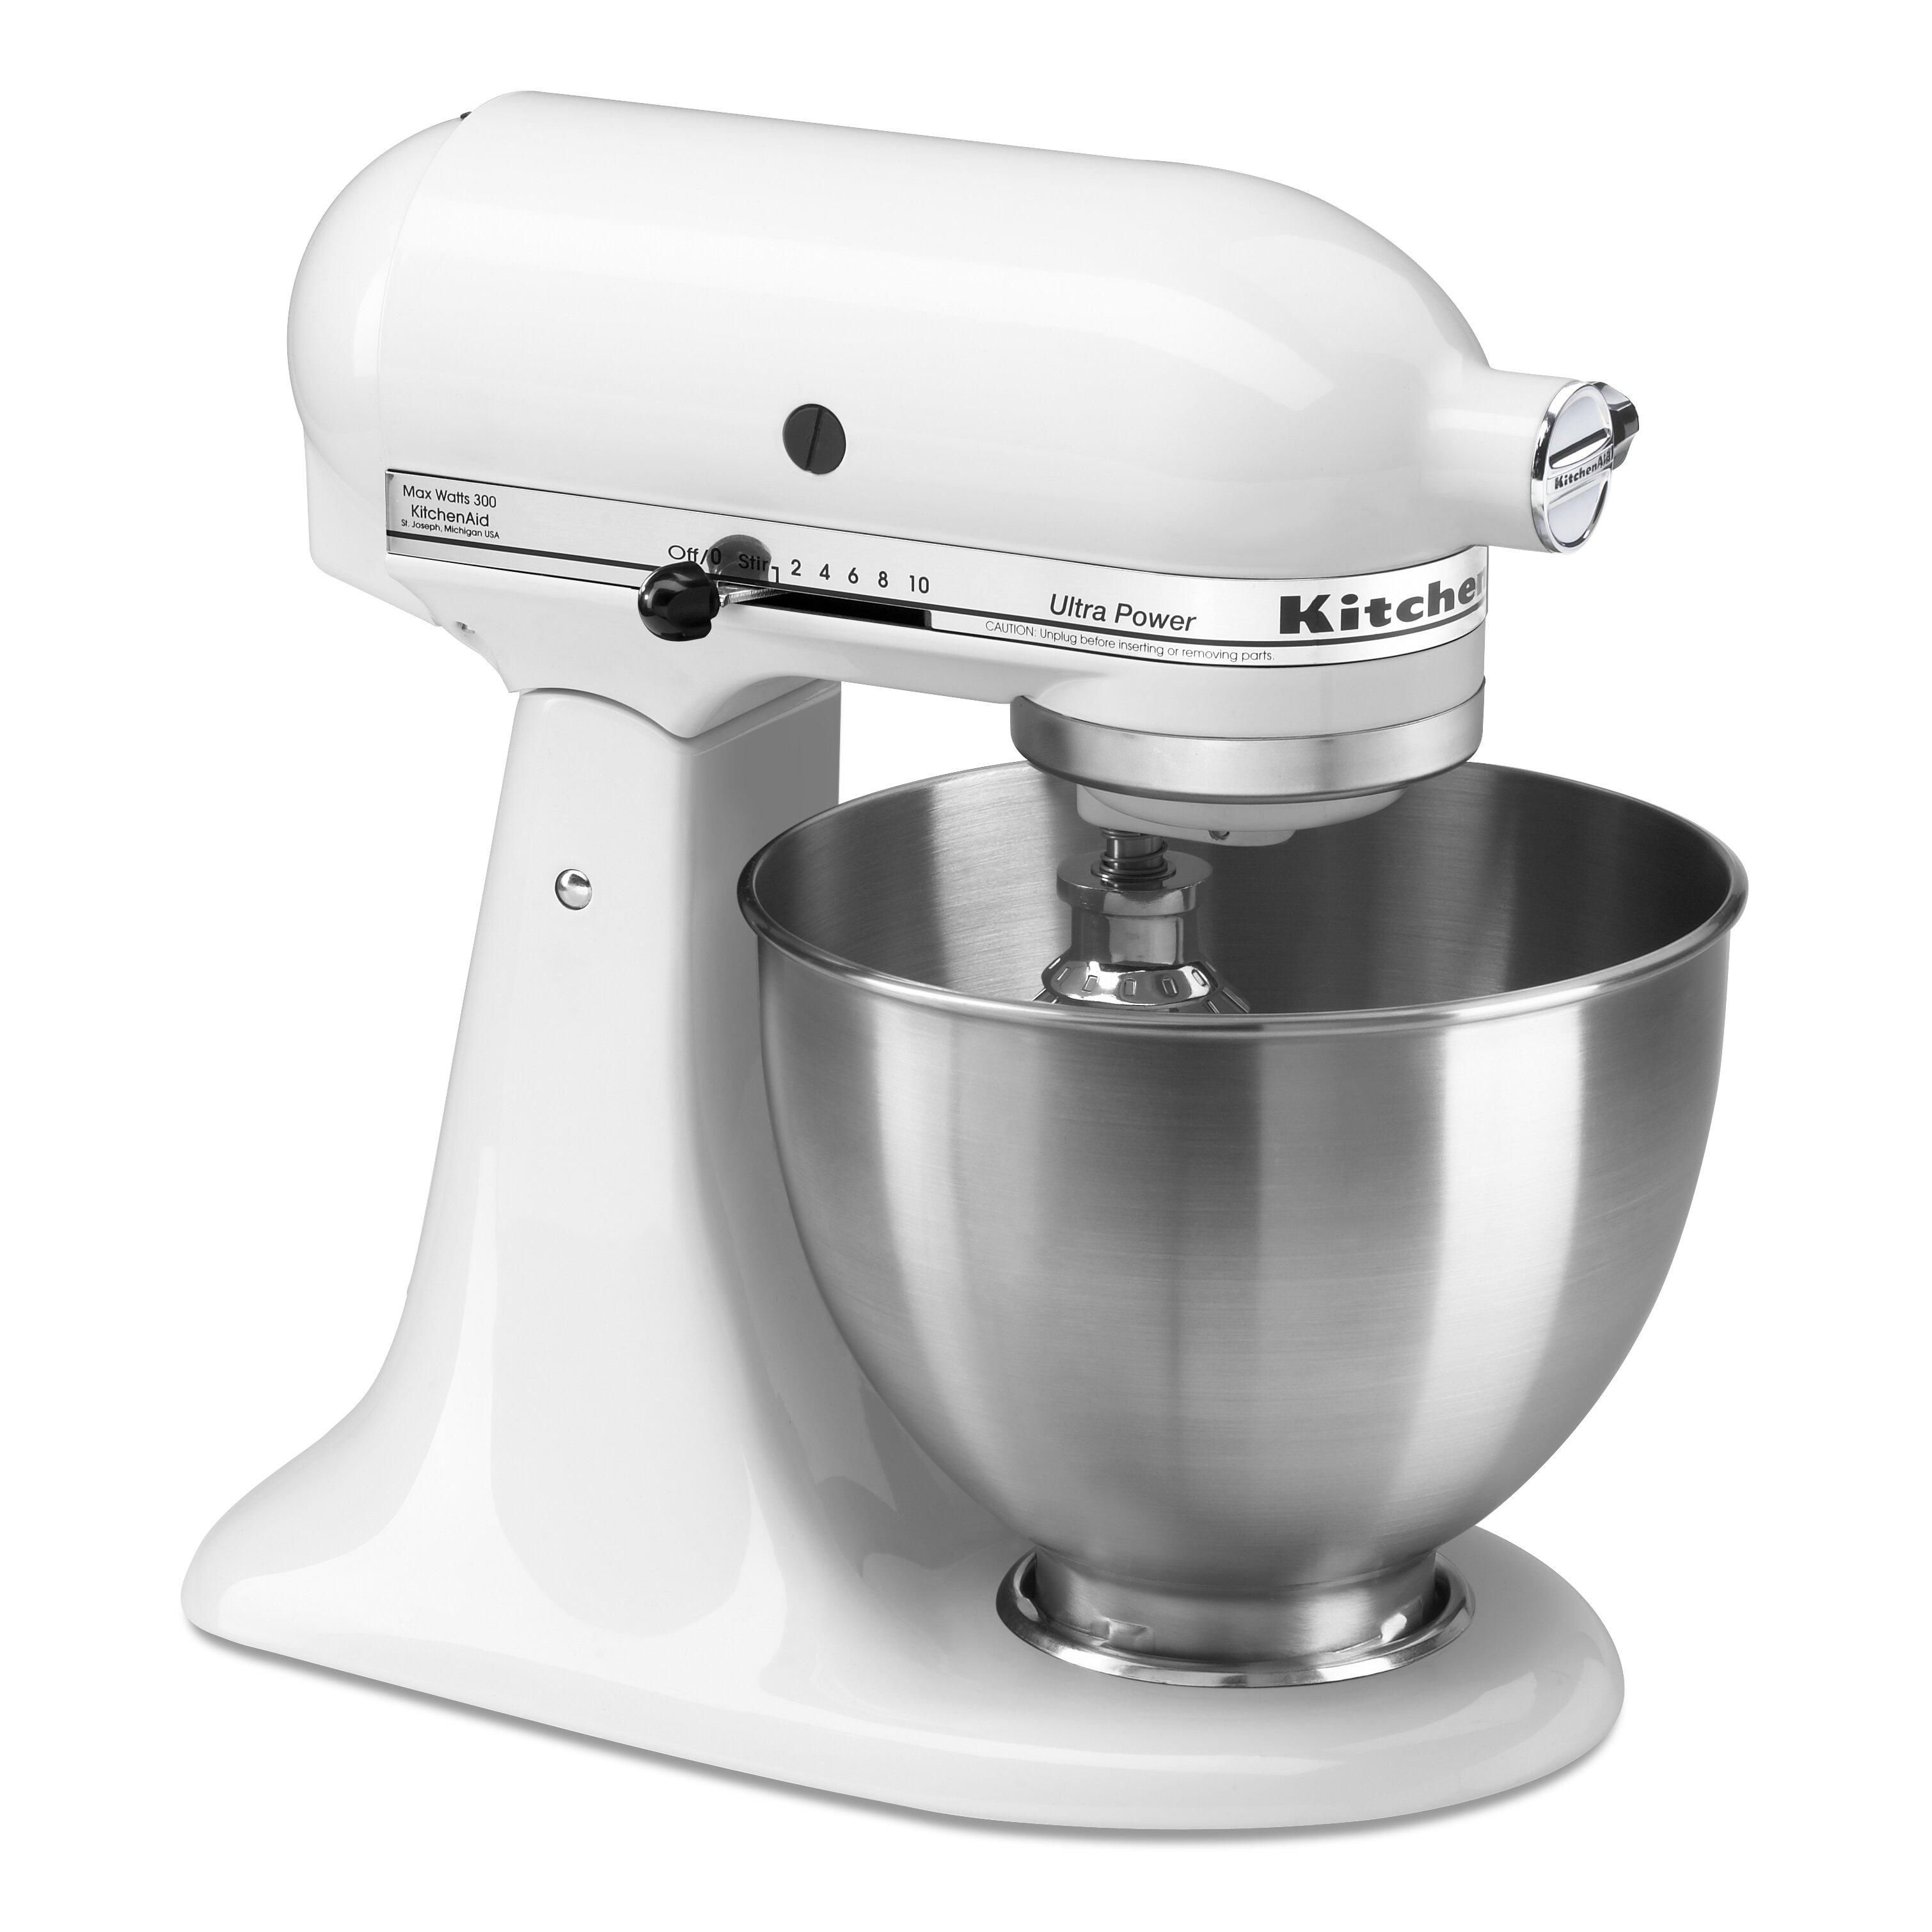 Kitchen Mixer Reviews: KitchenAid Ultra Power Series 4.5 Qt. Stand Mixer